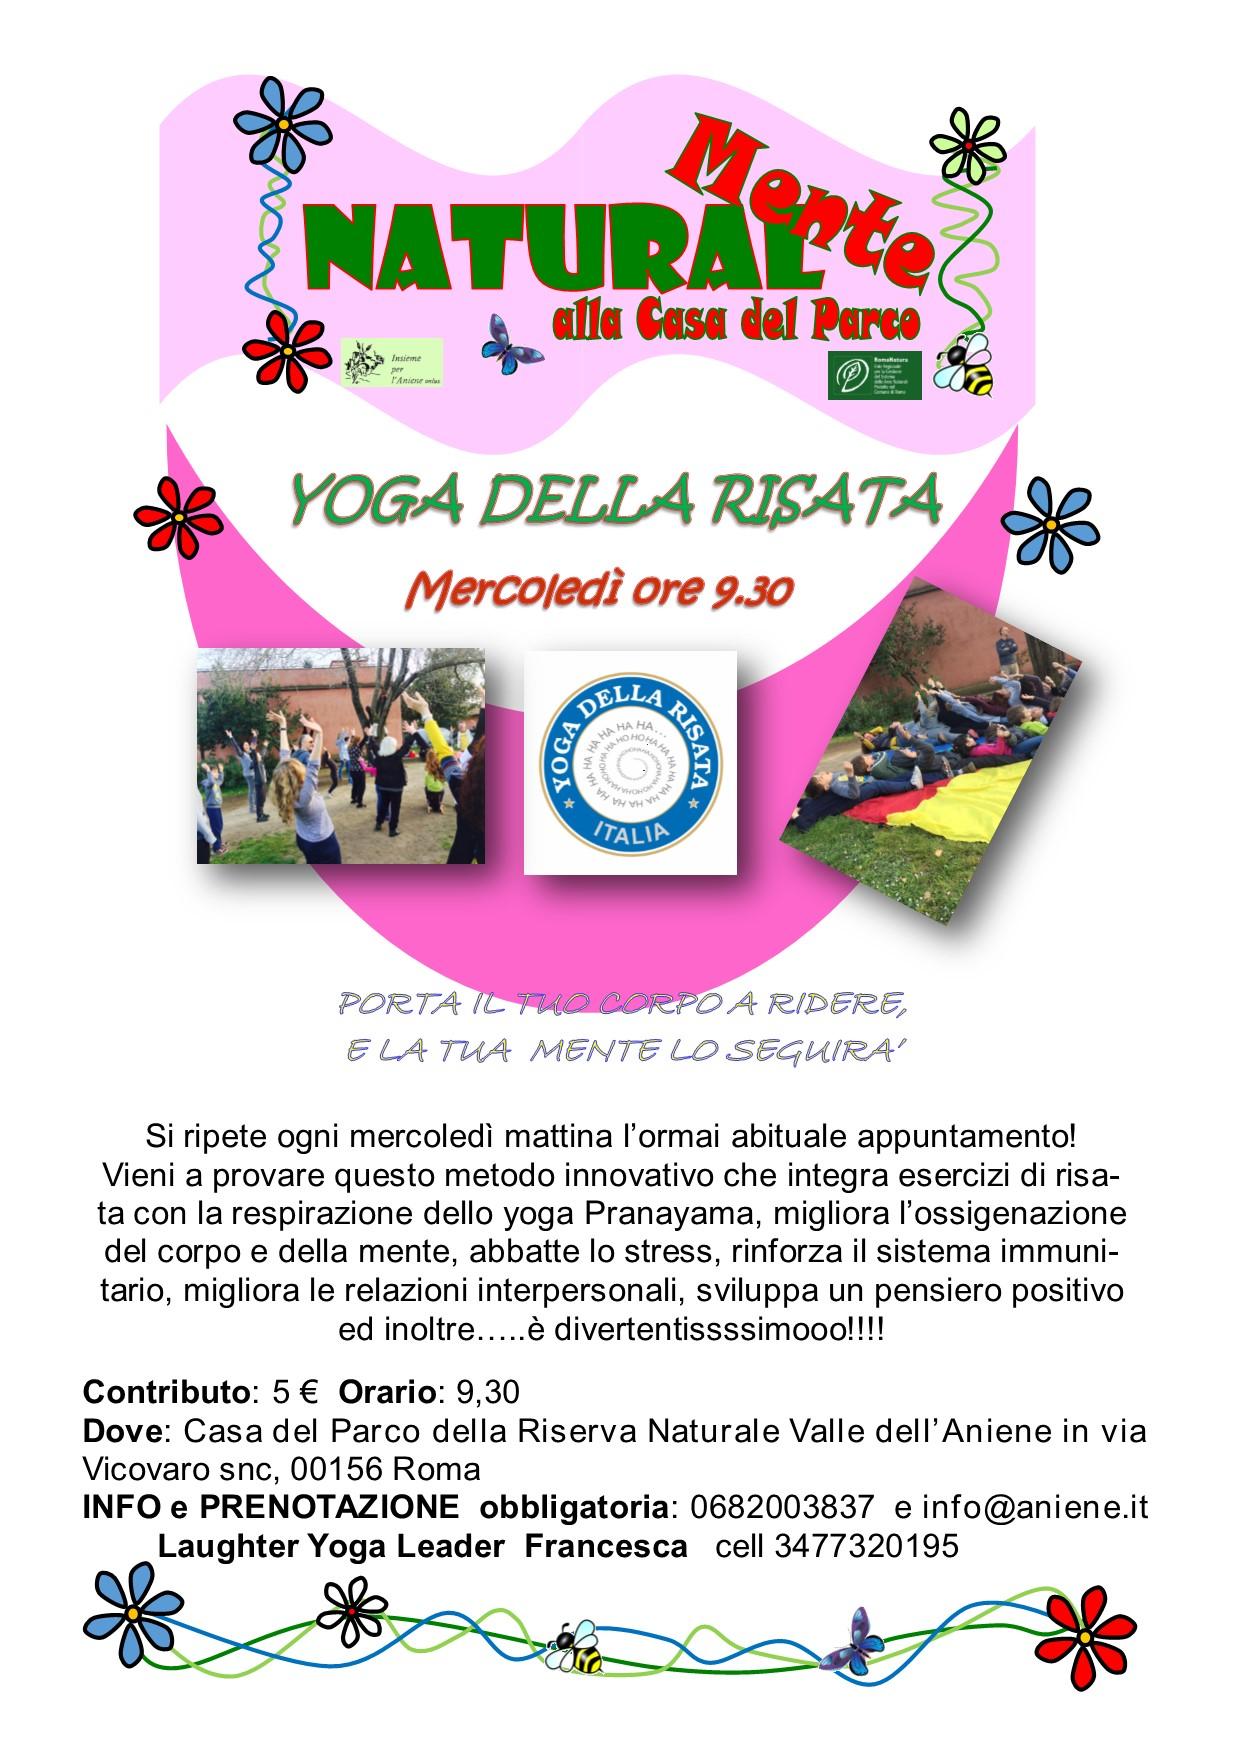 Yoga della Risata - mercoledì 26 aprile